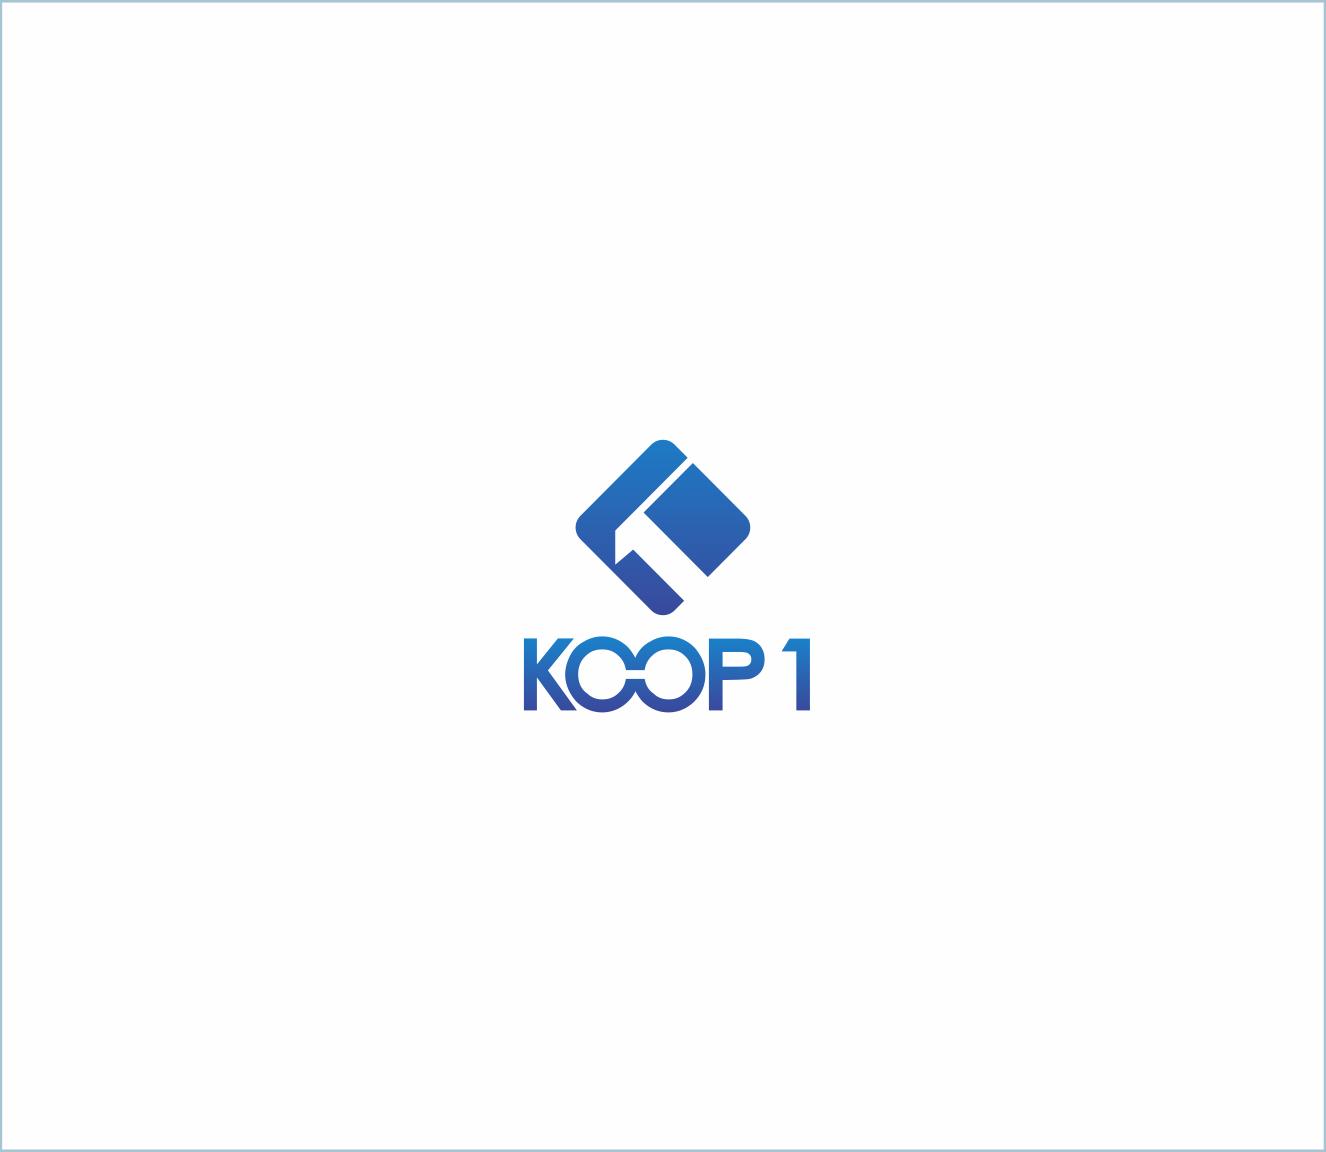 Logo Design by Armada Jamaluddin - Entry No. 143 in the Logo Design Contest Creative Logo Design for KOOP 1.